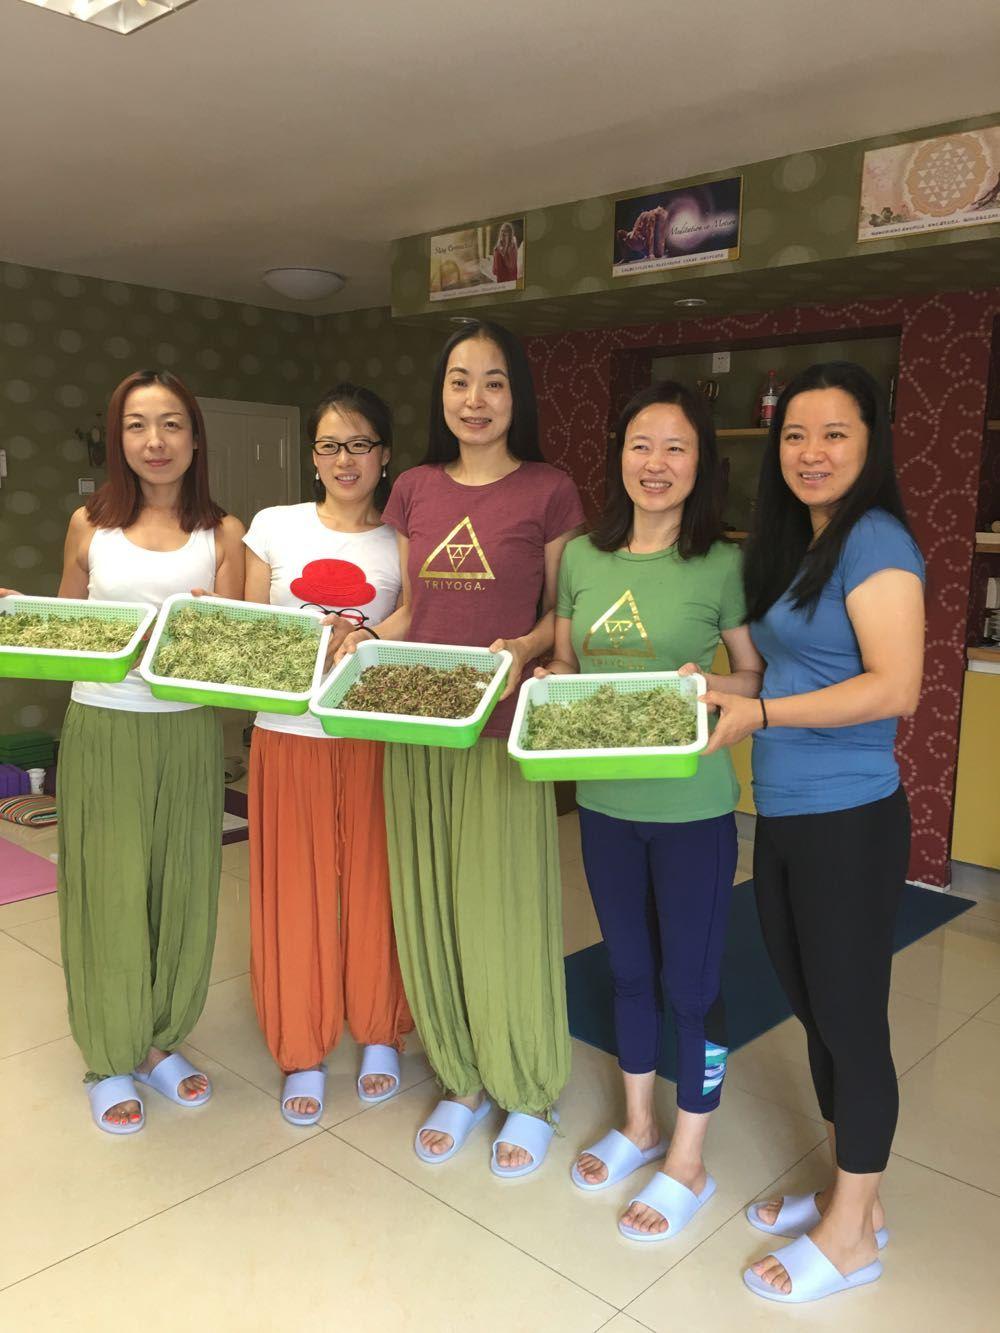 Beijing_Basisc_2017_Sprouts